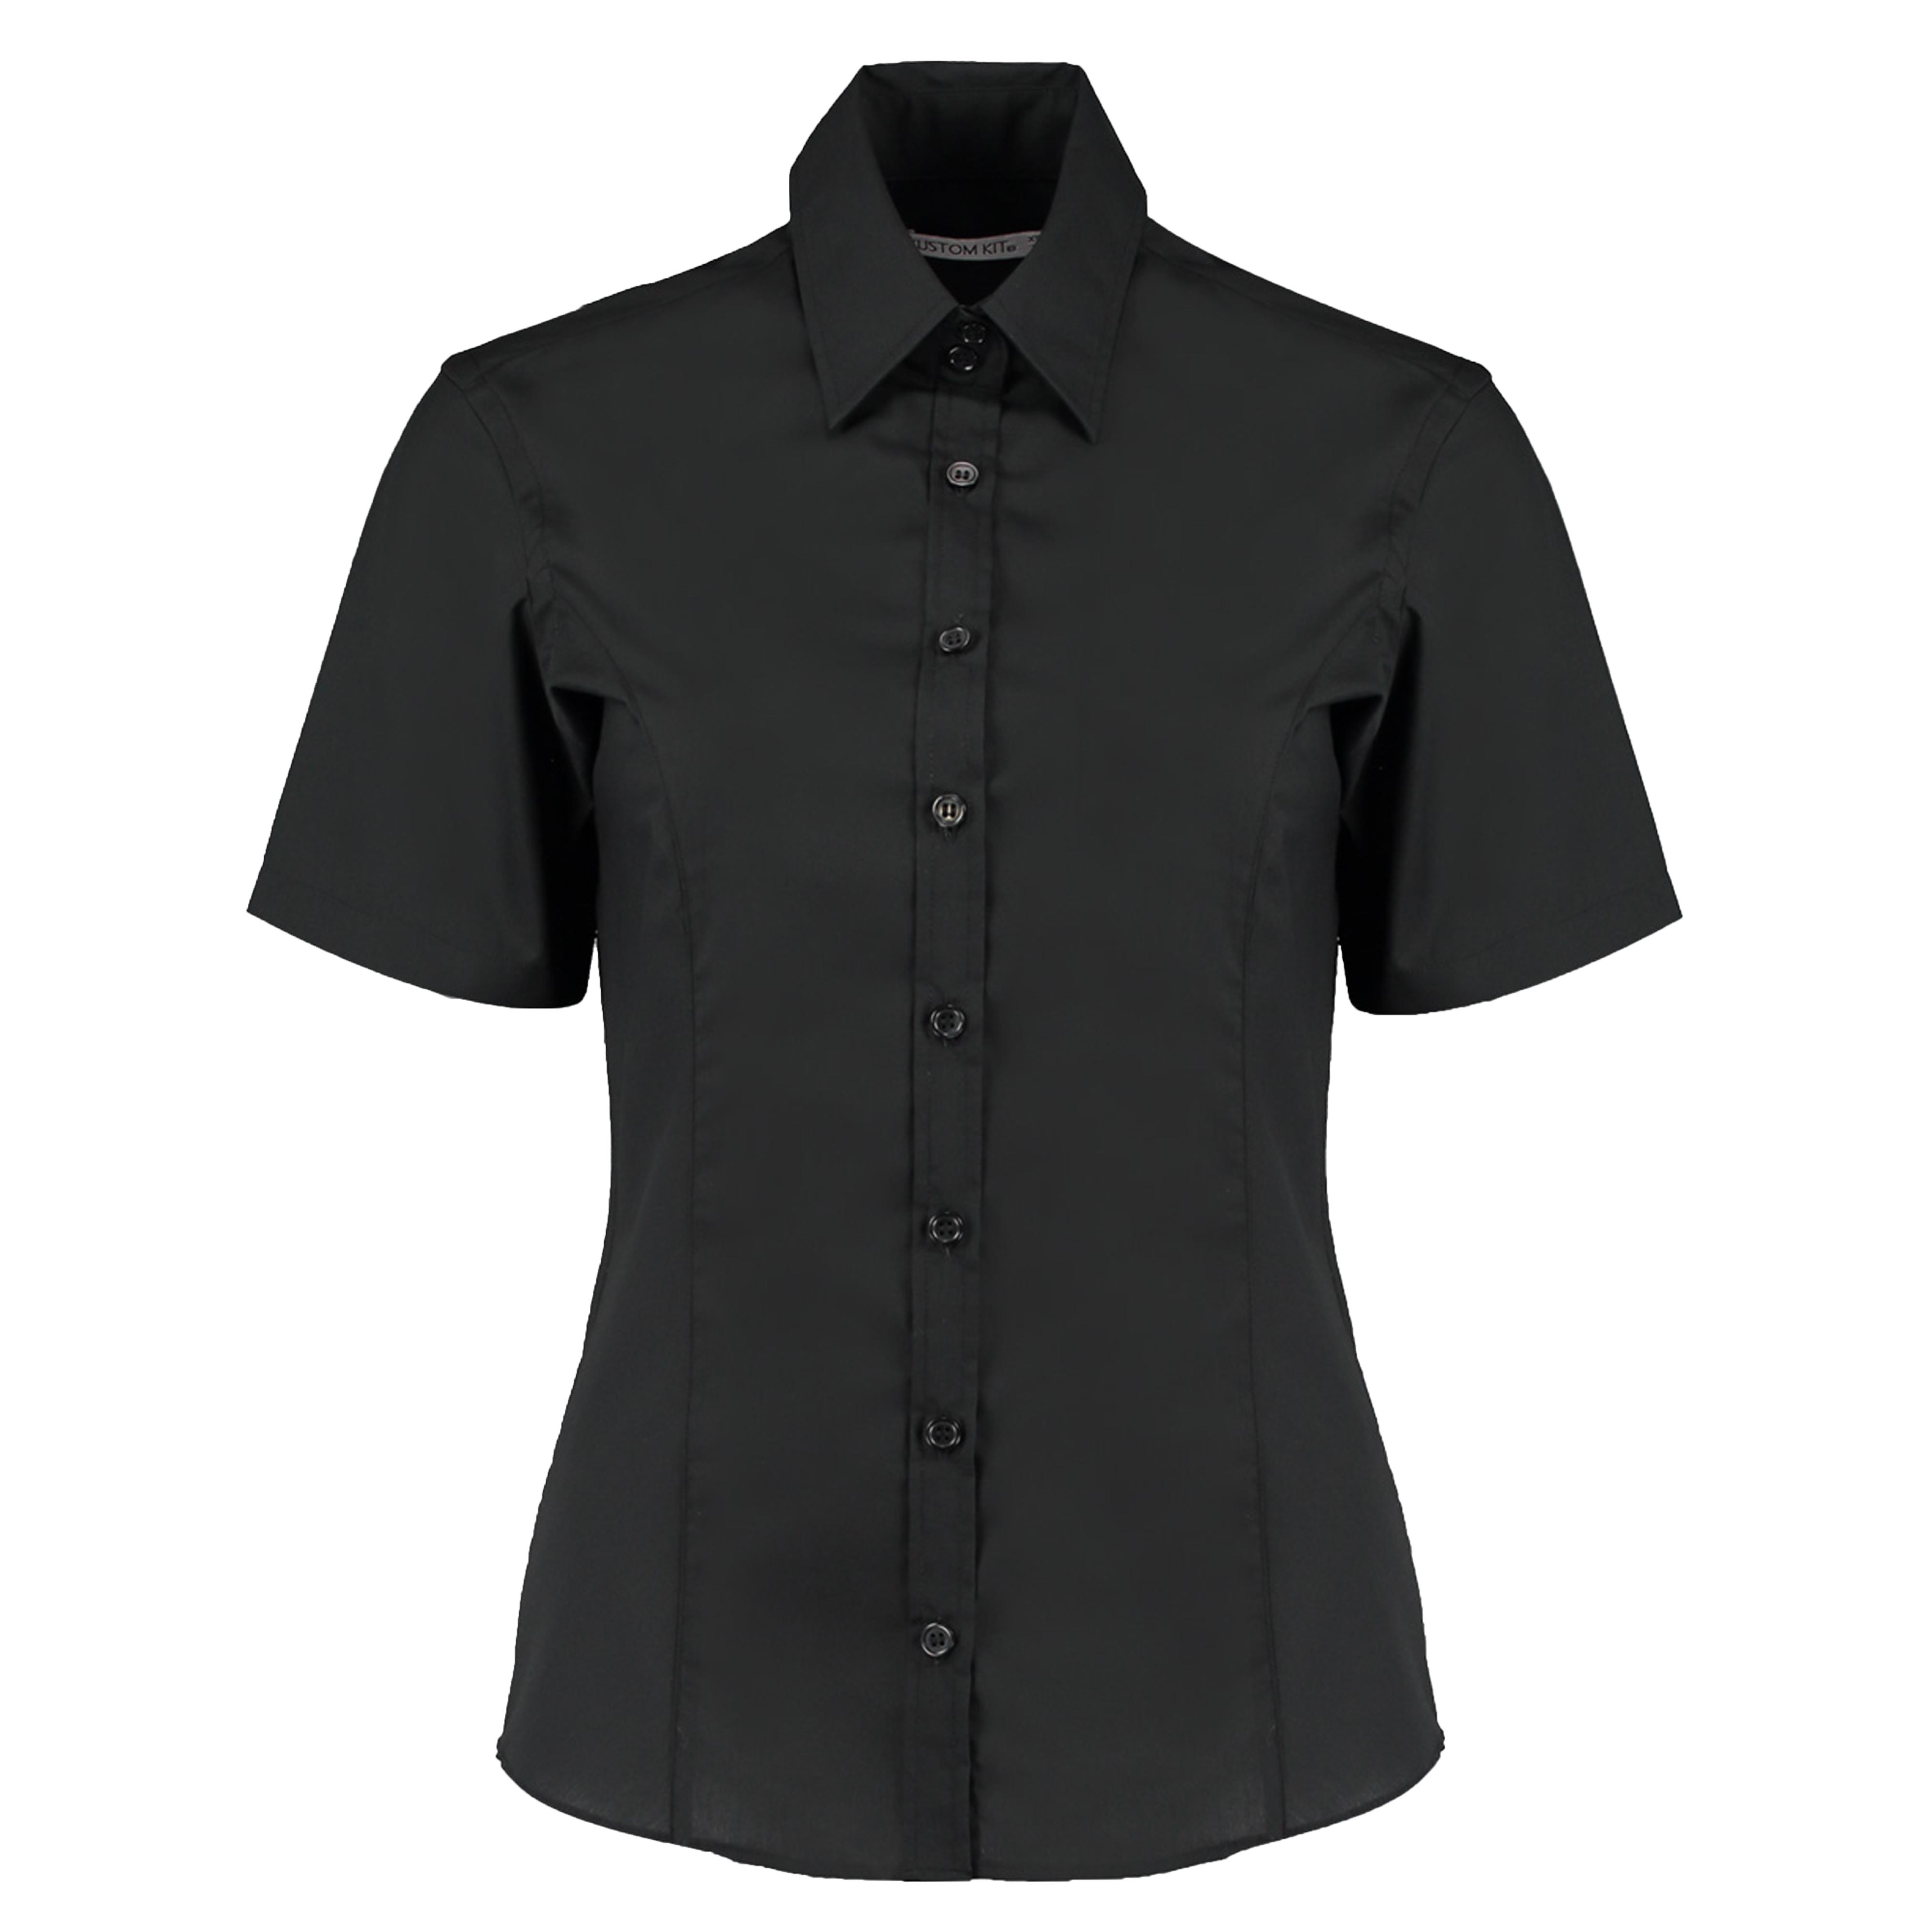 Kustom Kit Womens Ladies Plain Long Sleeved Shirt Work Formal Office Business Tailored Fit